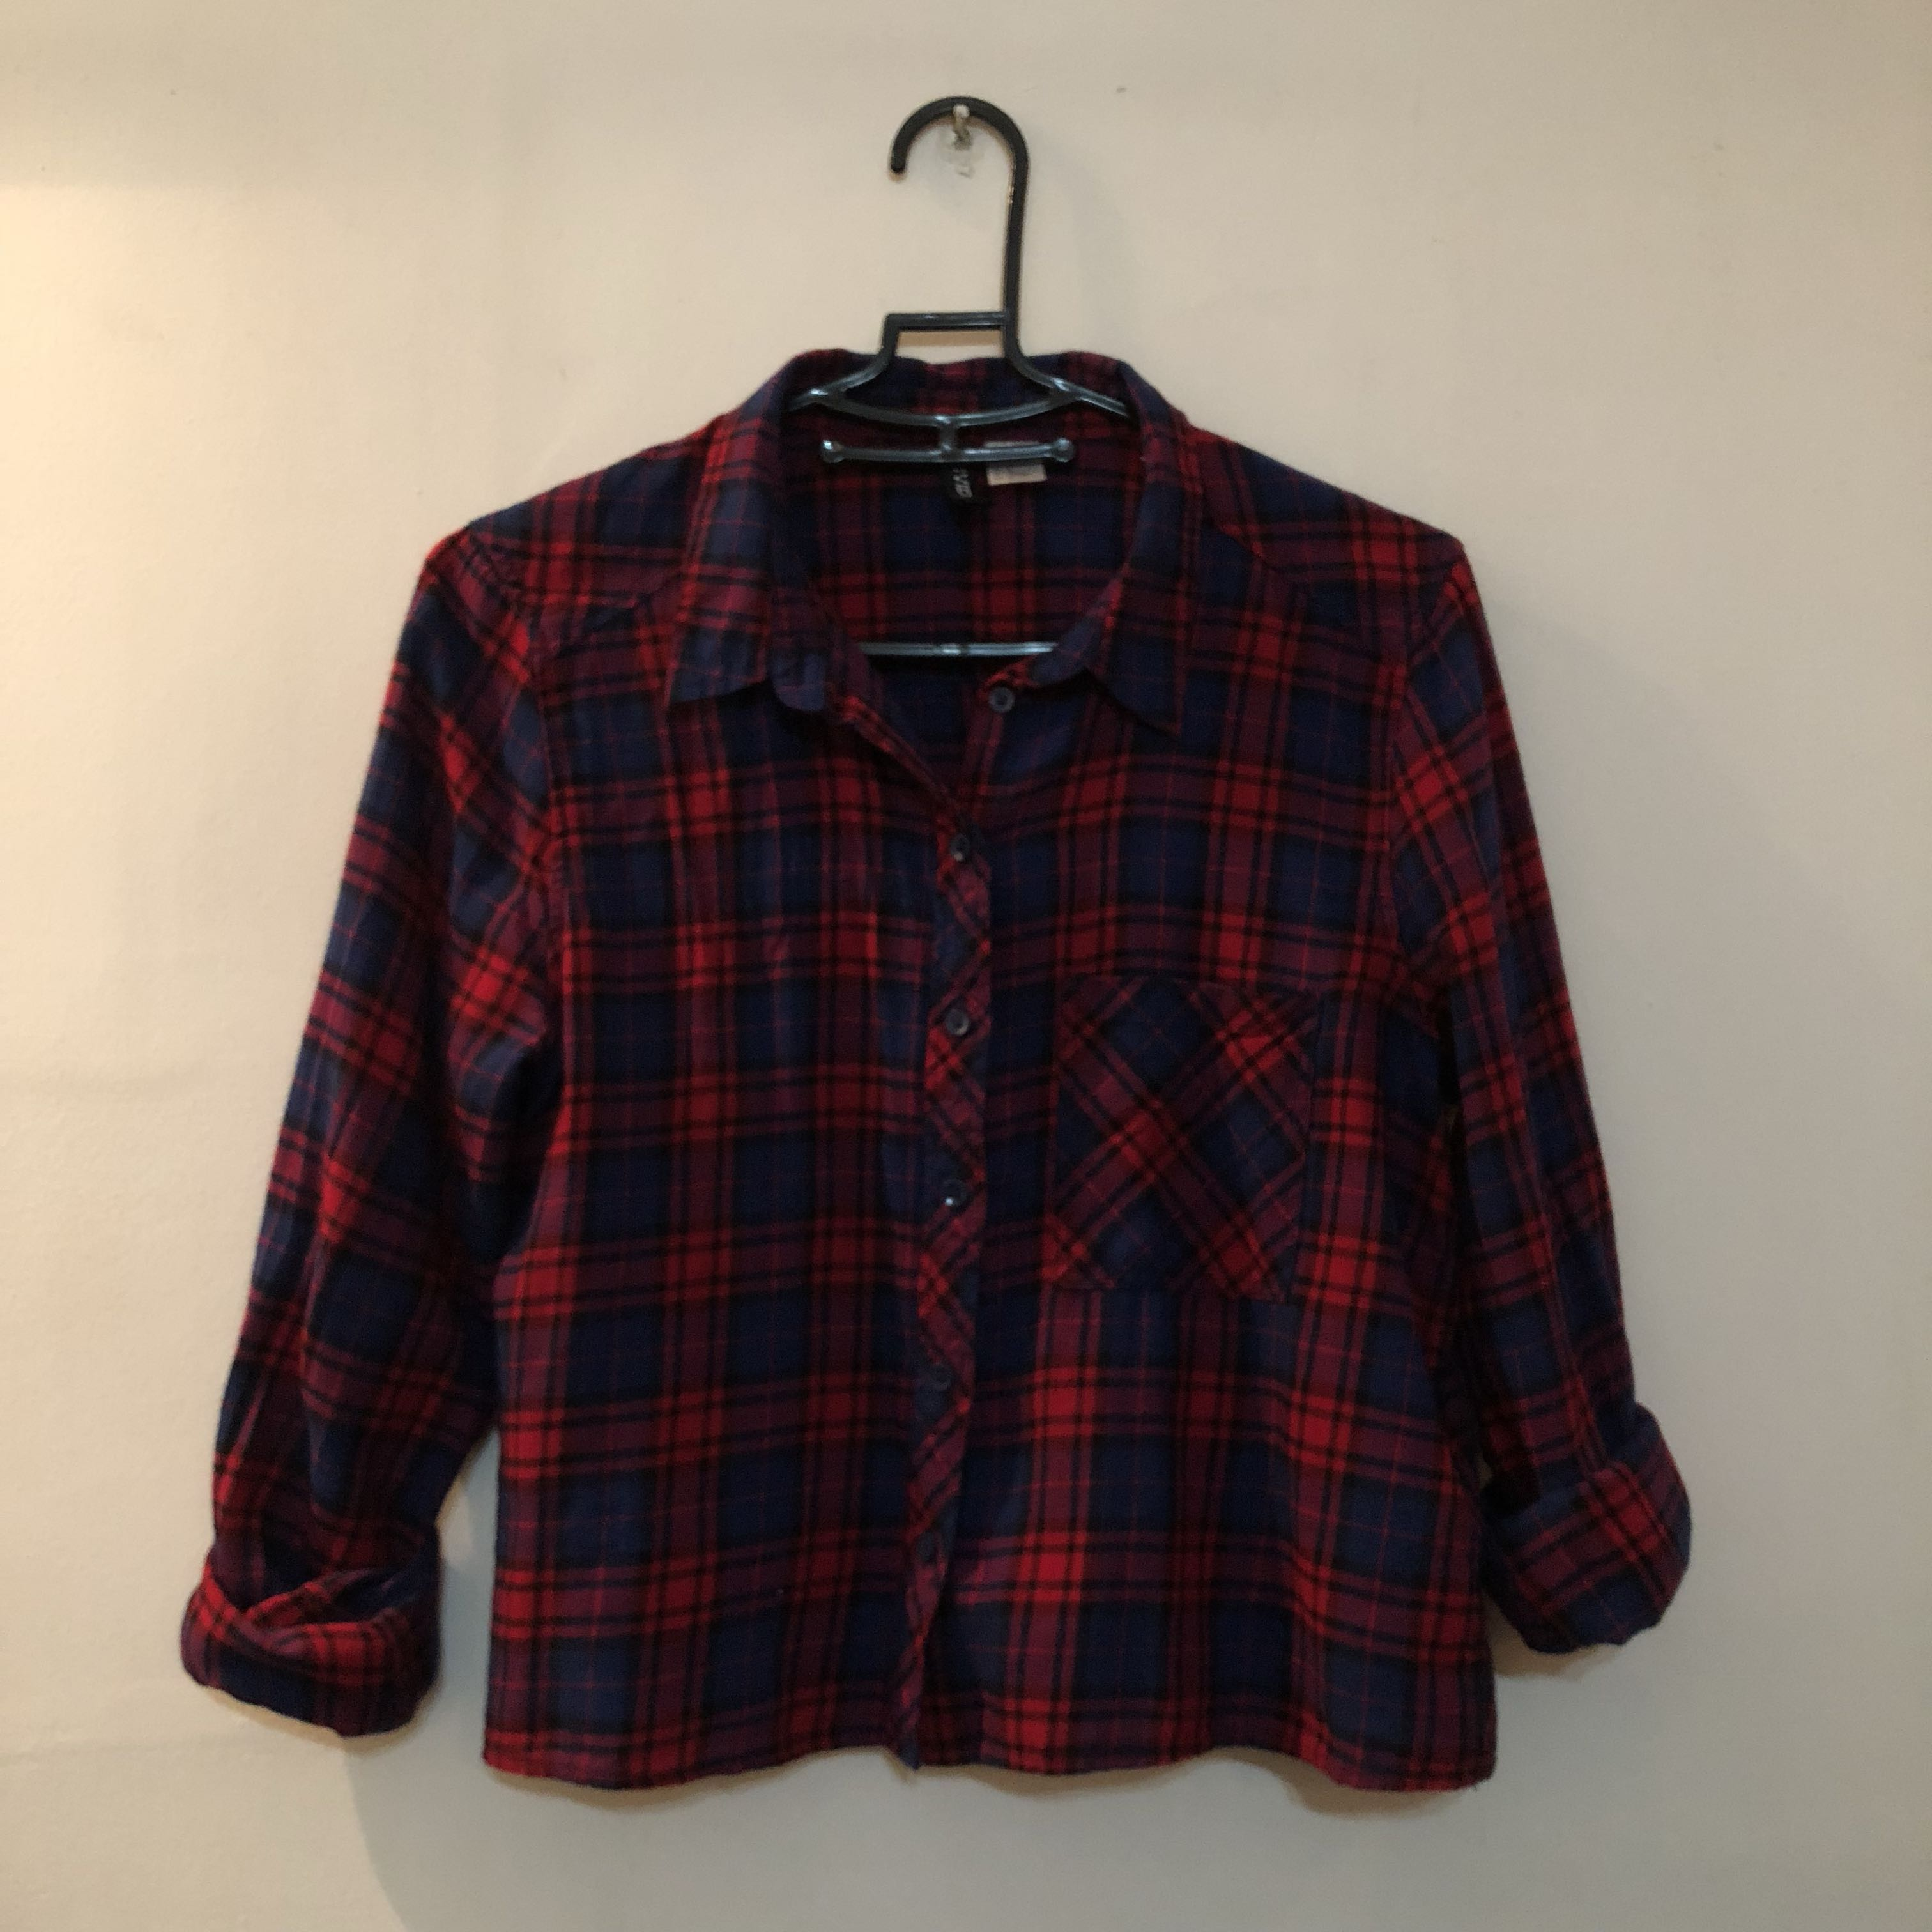 2e00e6cc H&M checkered flannel crop top, Women's Fashion, Clothes, Tops on ...